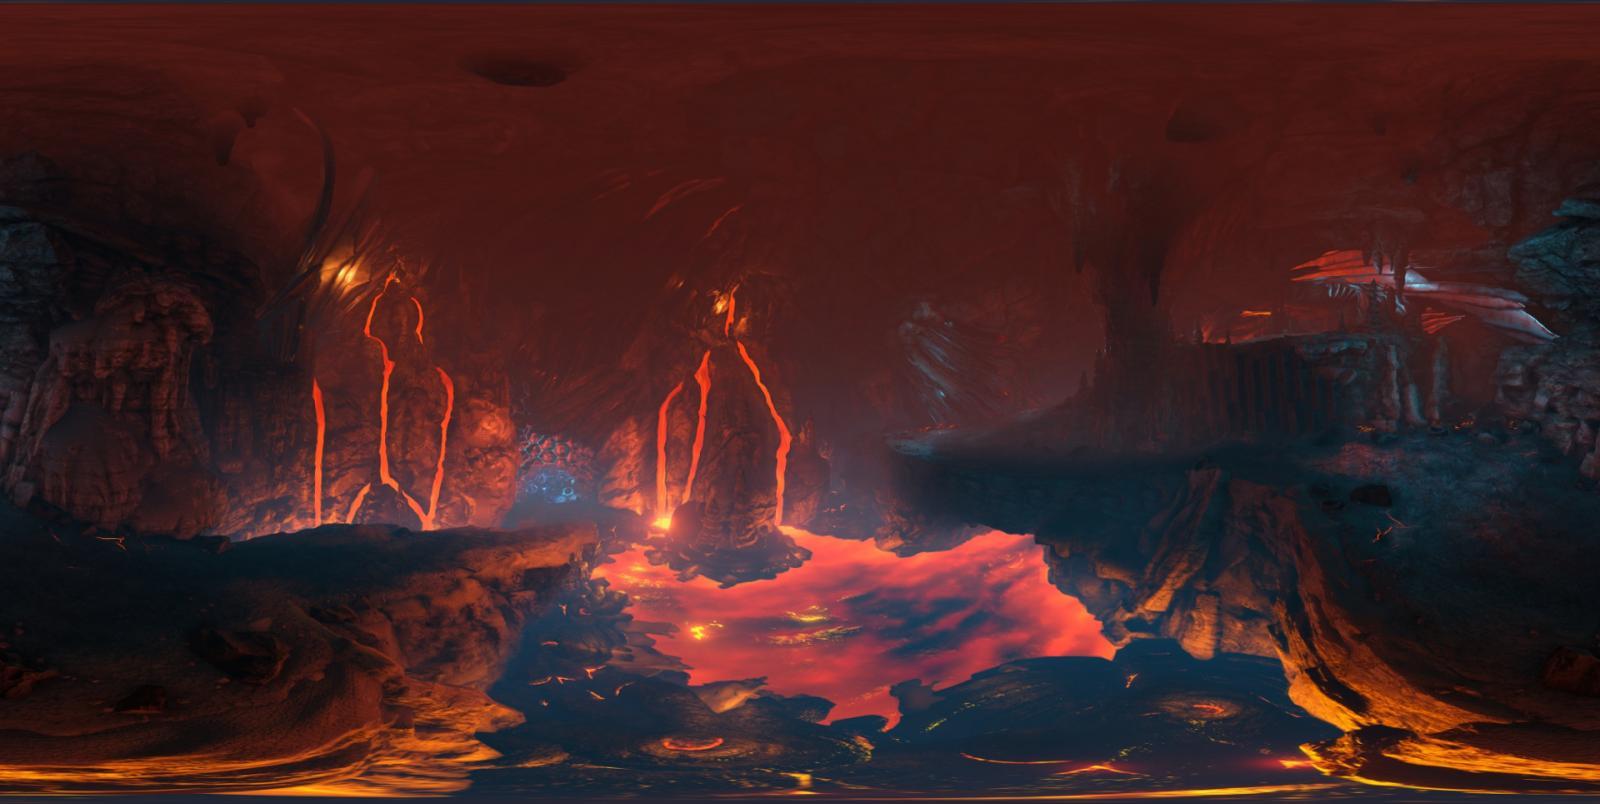 large.59218e474334a_EXFIB0-VolcanoCave-360Stereosta.jpg